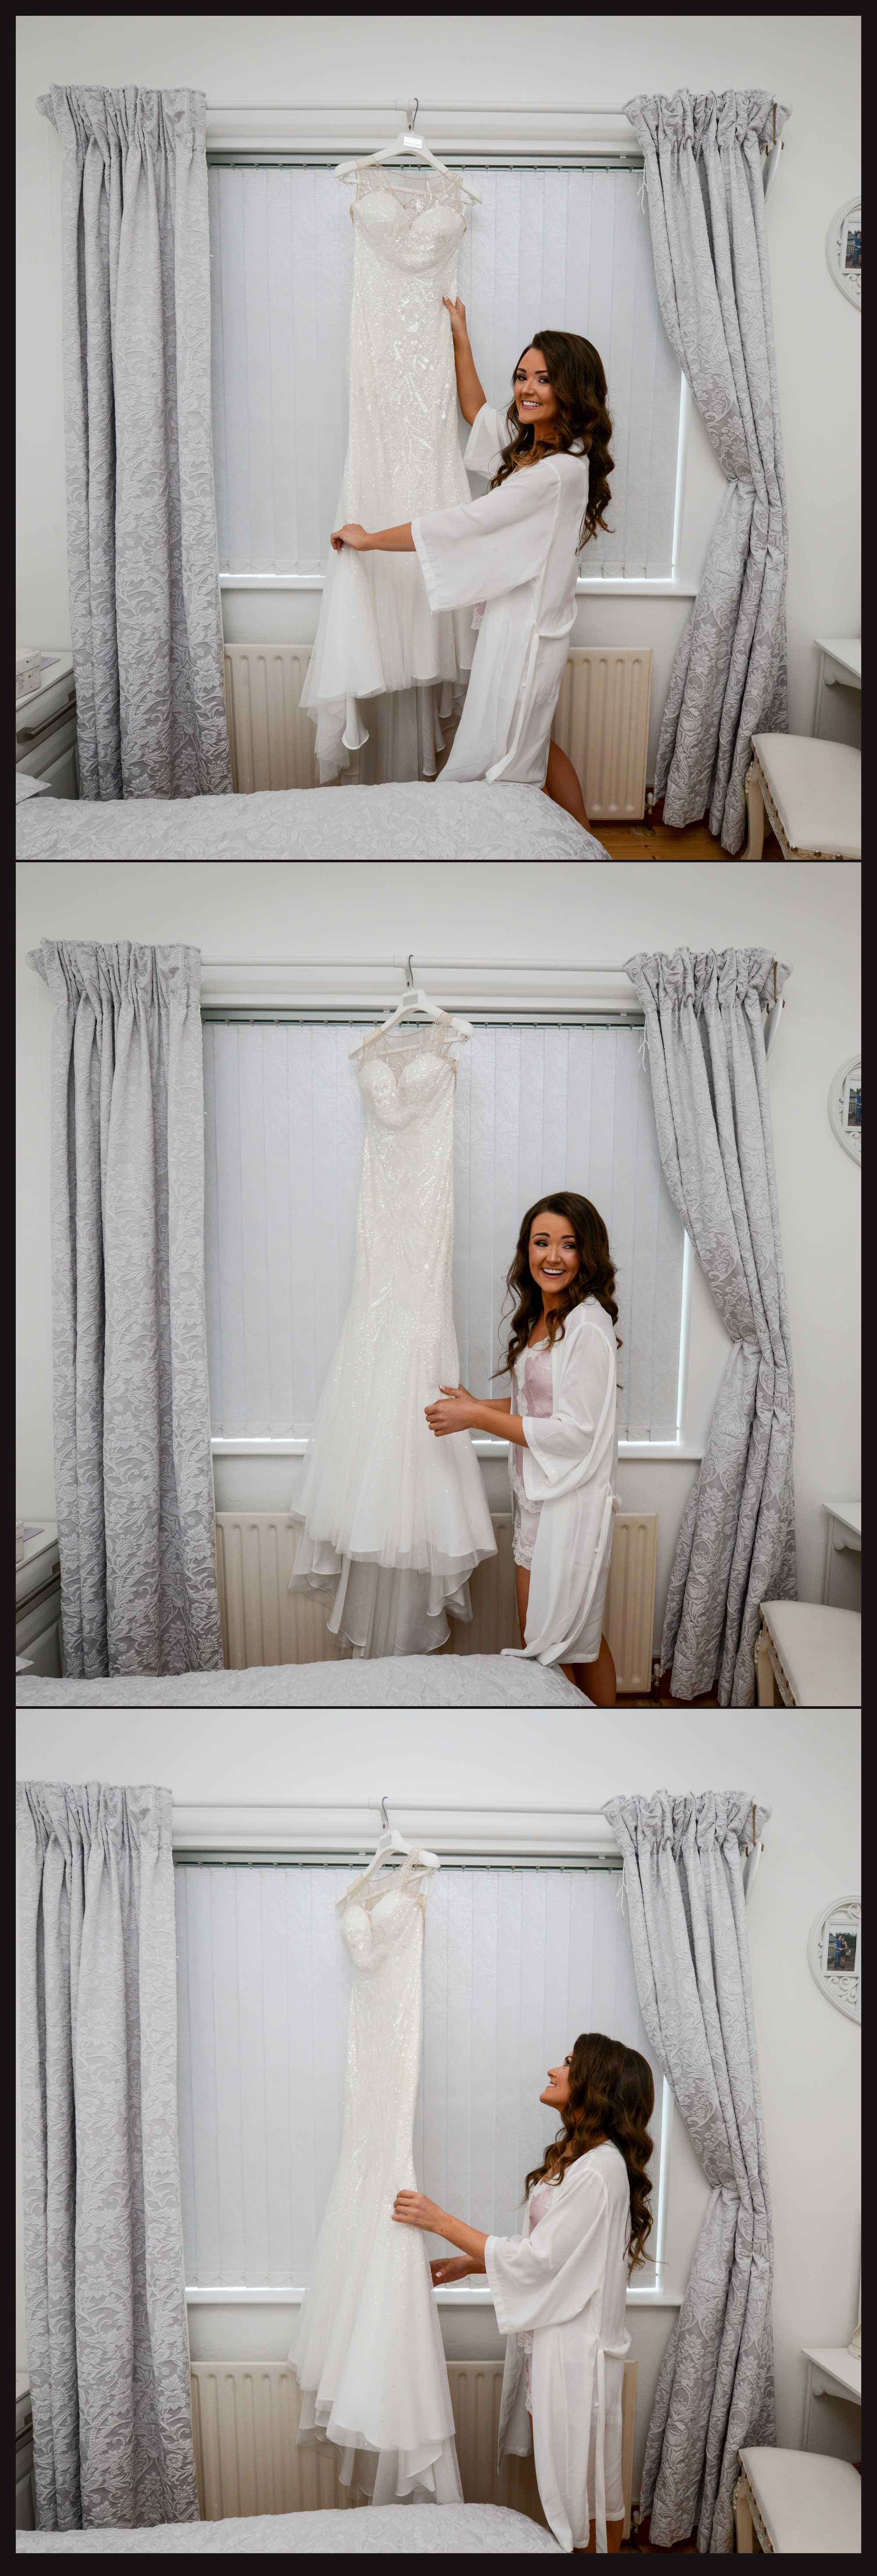 blathnaid_lee_wedding_day_images_omagh_bridal_dress_cararose_wedding_gown